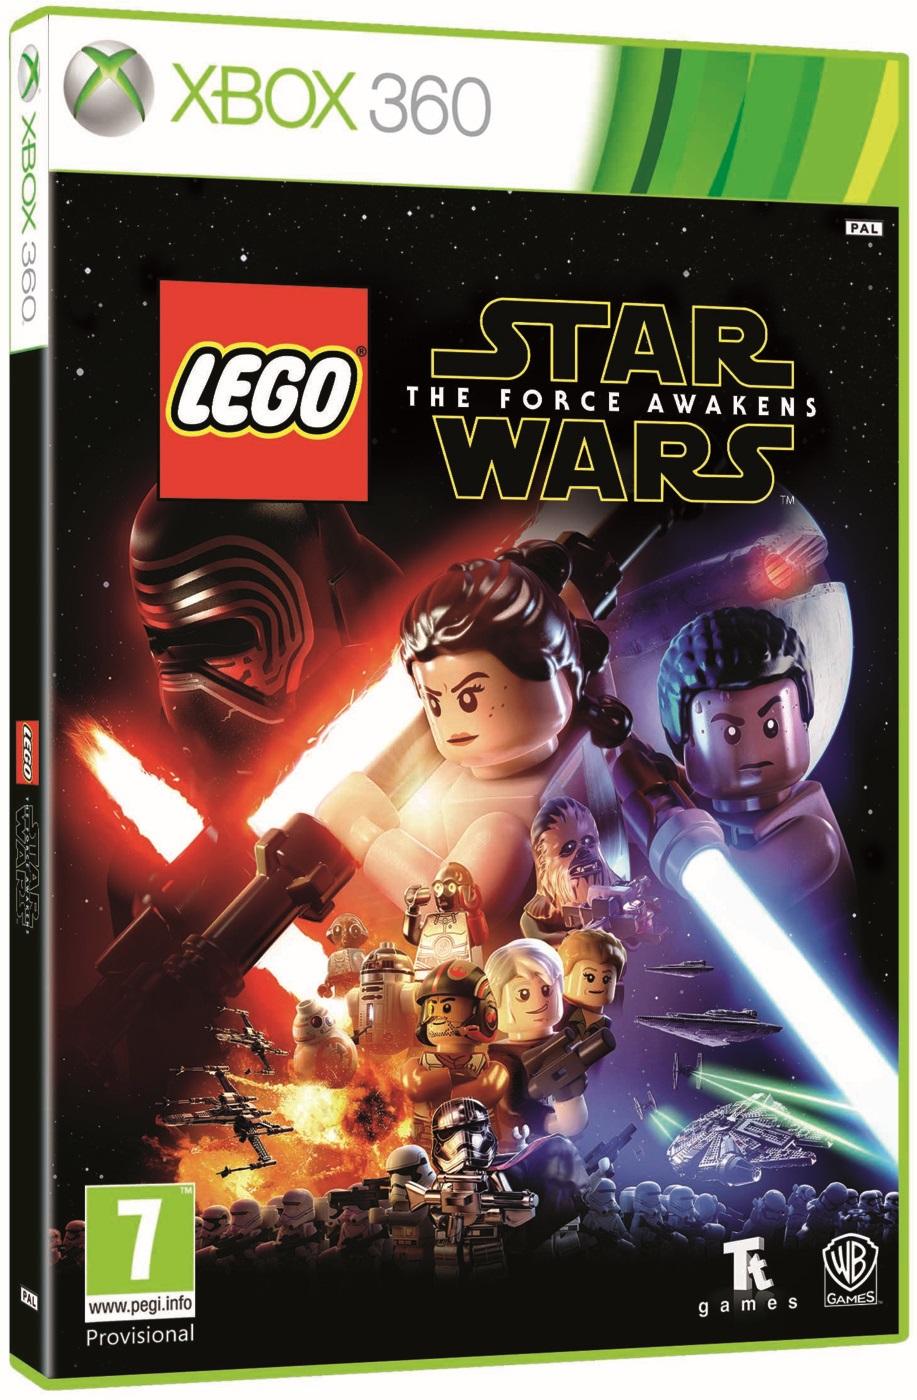 LEGO STAR WARS: THE FORCE AWAKENS - X360